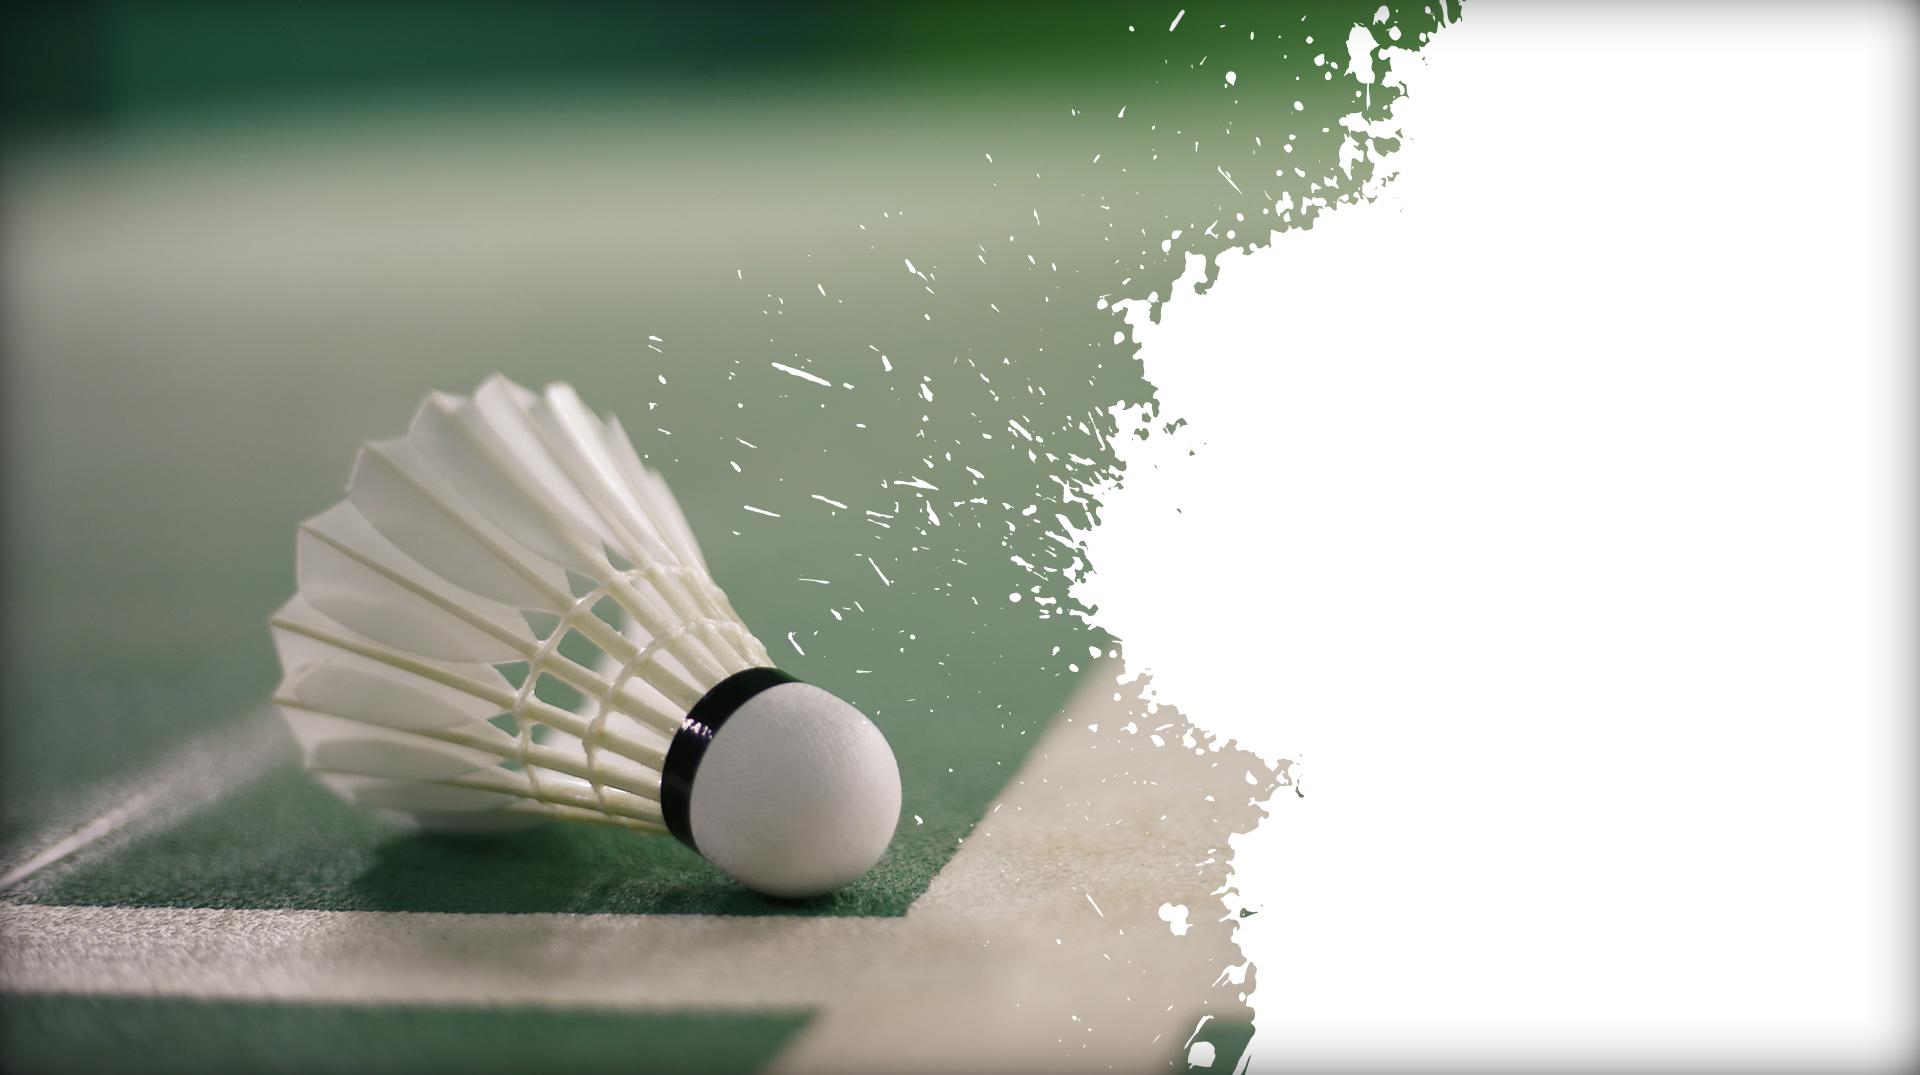 Volan de badminton